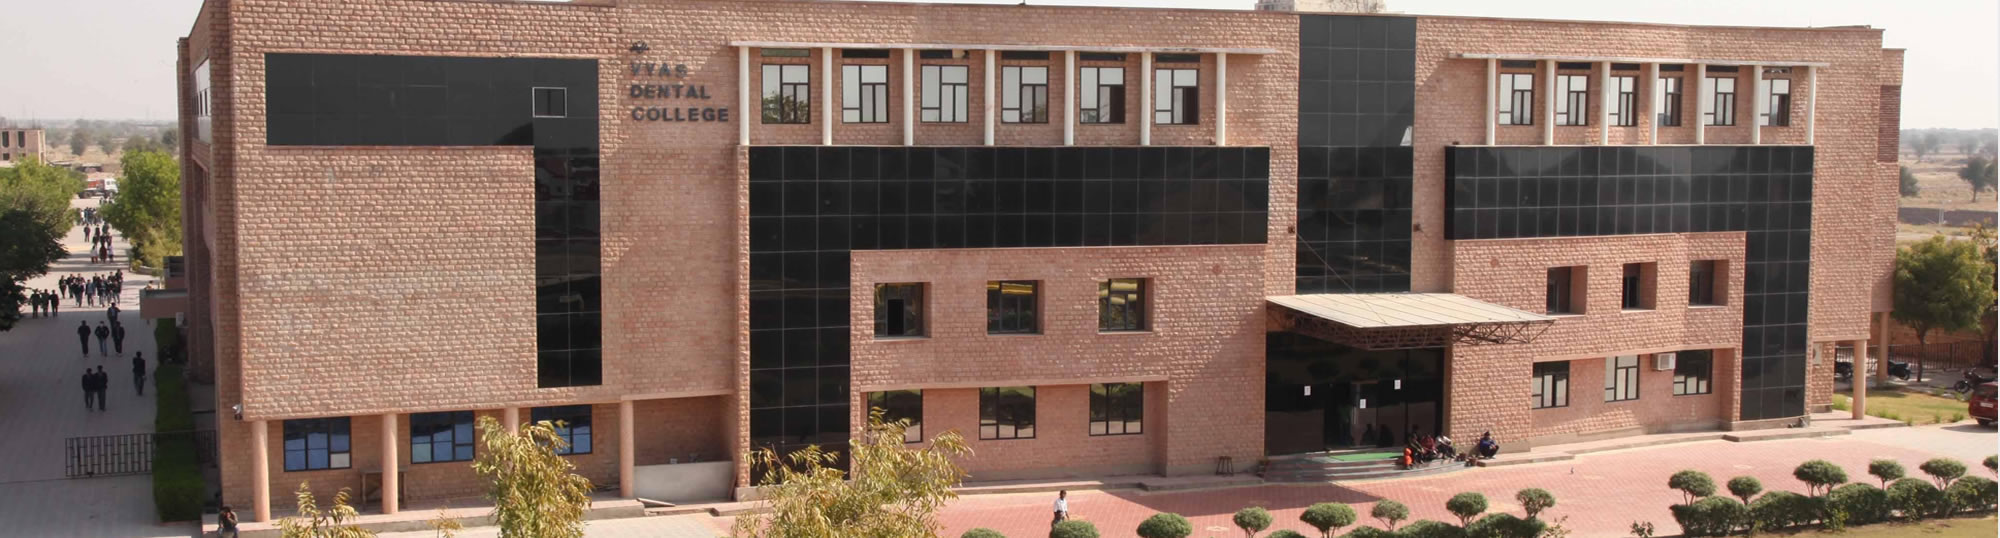 Vyas Dental College and Hospital, Jodhpur Image